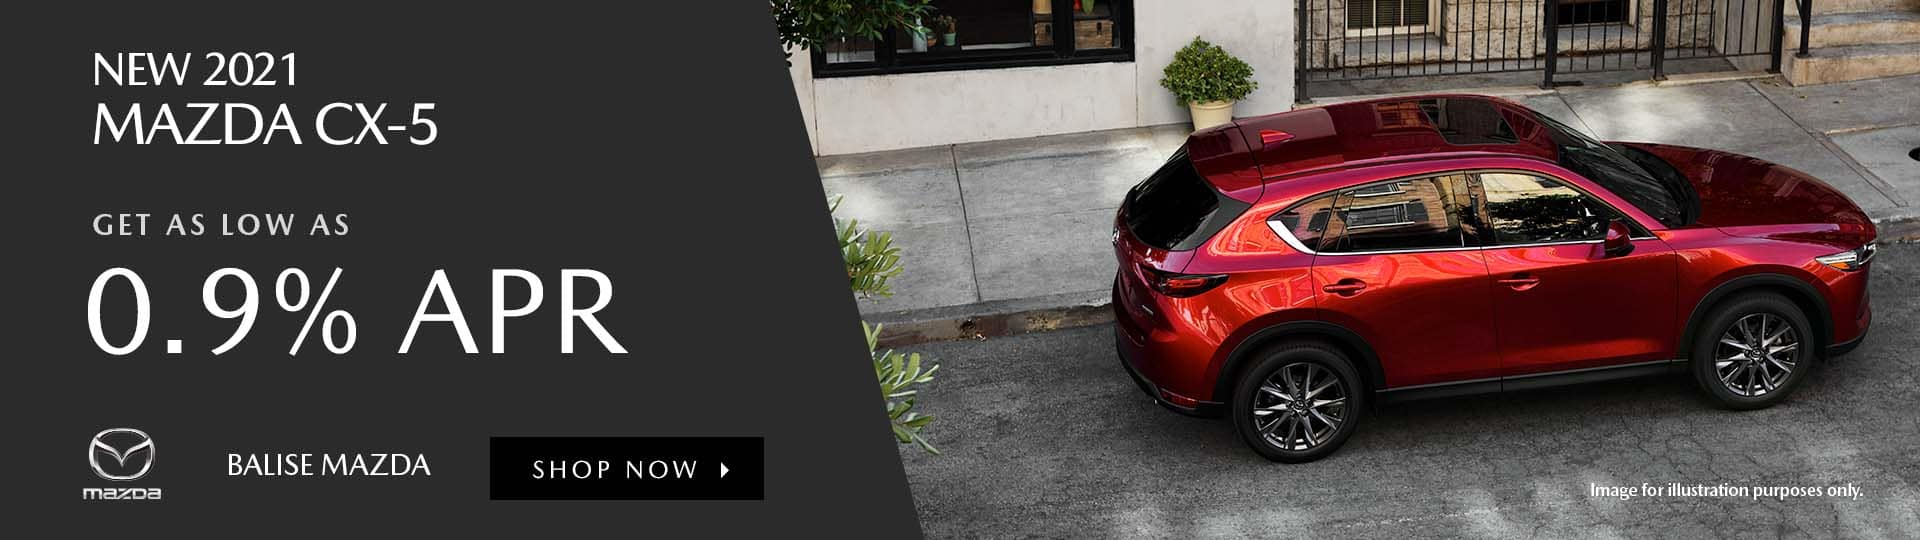 New 2021 Mazda CX-5 Special